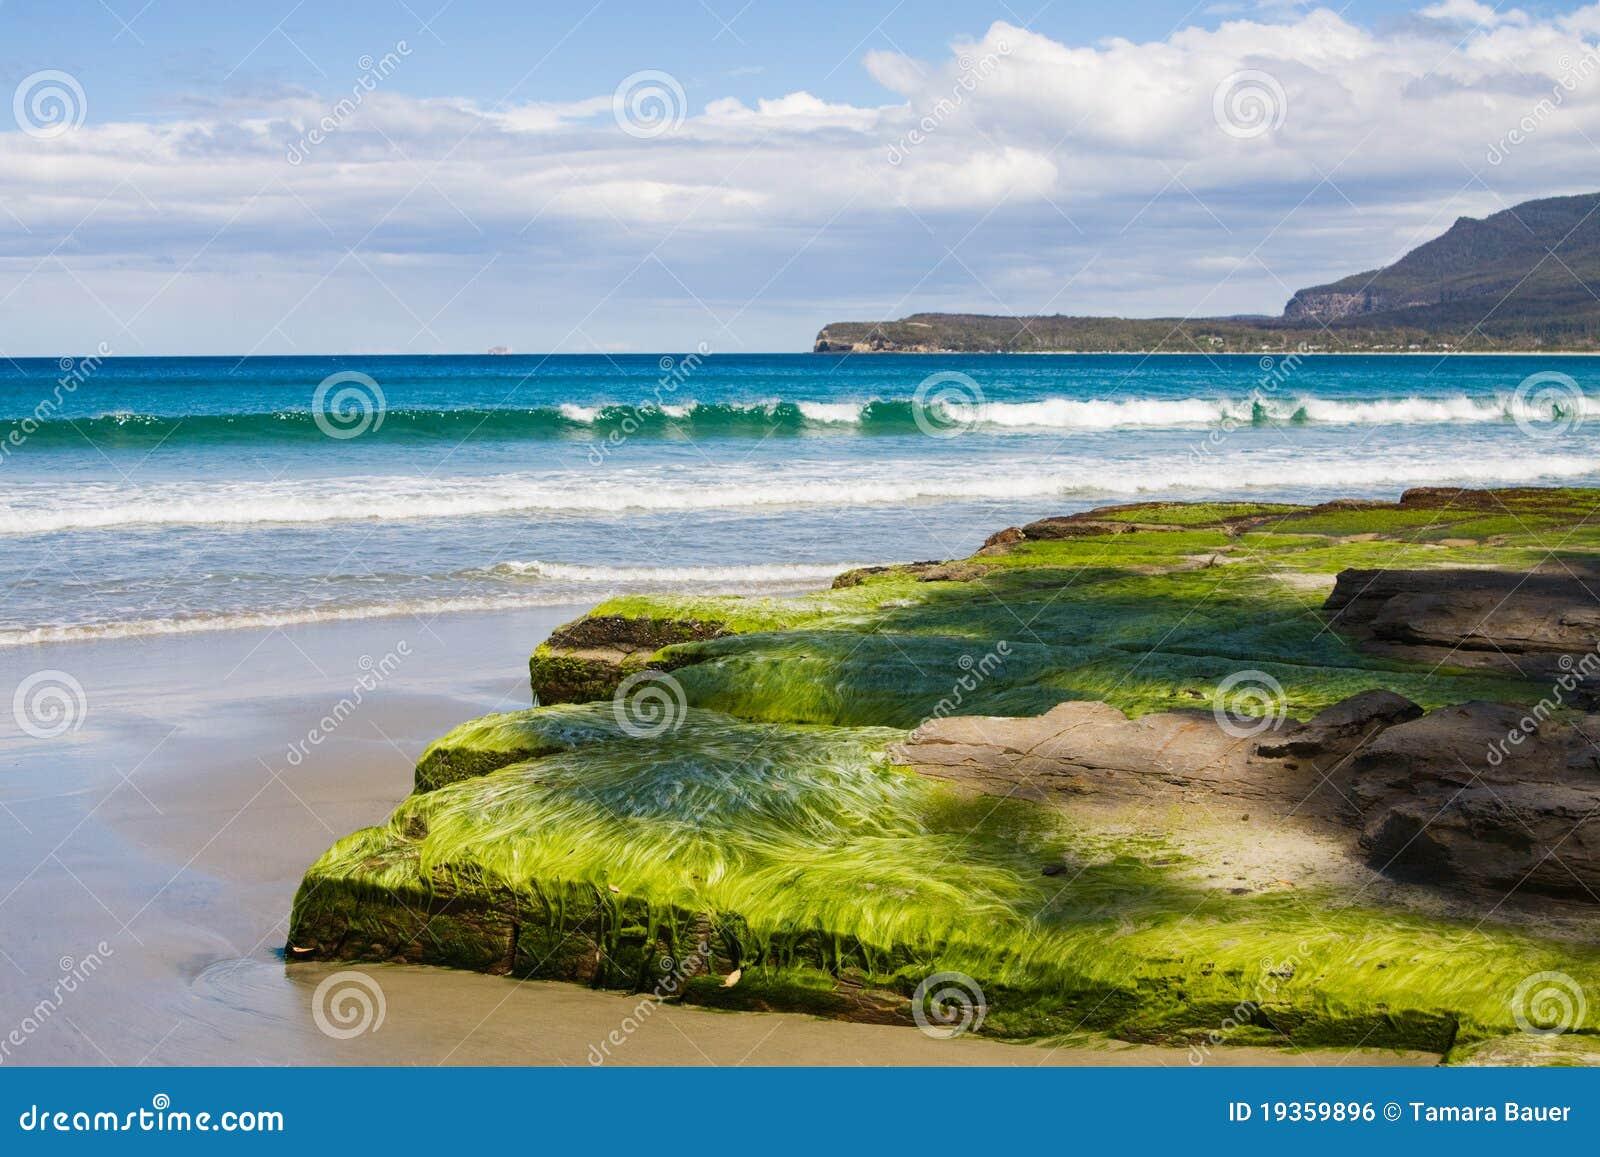 Alga em pavimento tessellated, praia